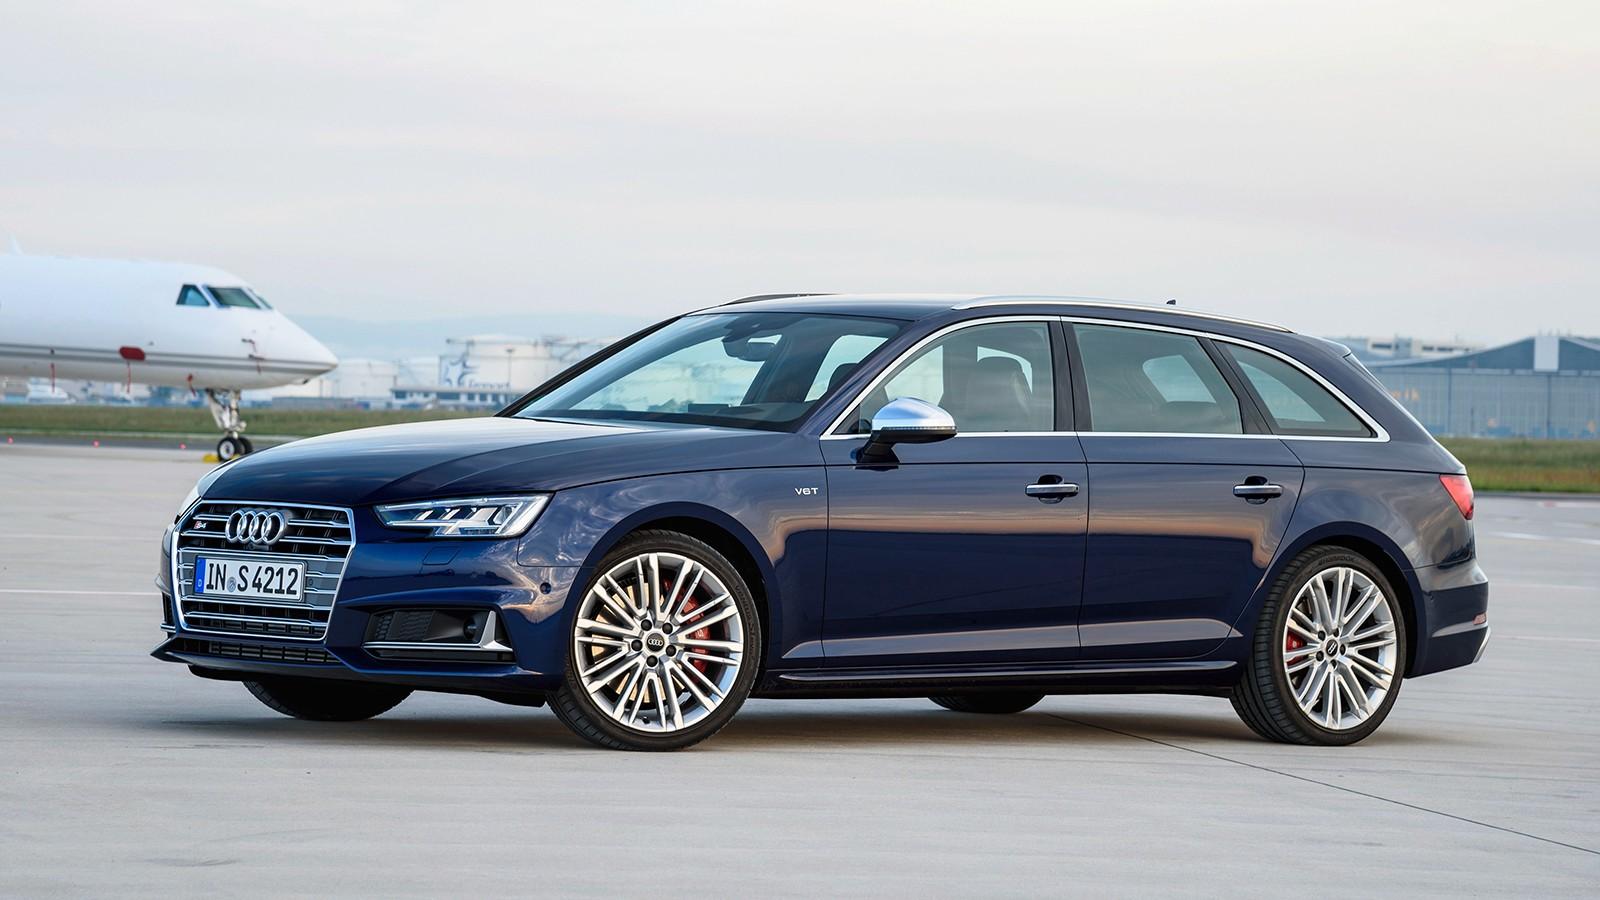 На фото: Audi S4 Avant. Универсал оснащён трёхлитровым TFSI мощностью 354 л.с.